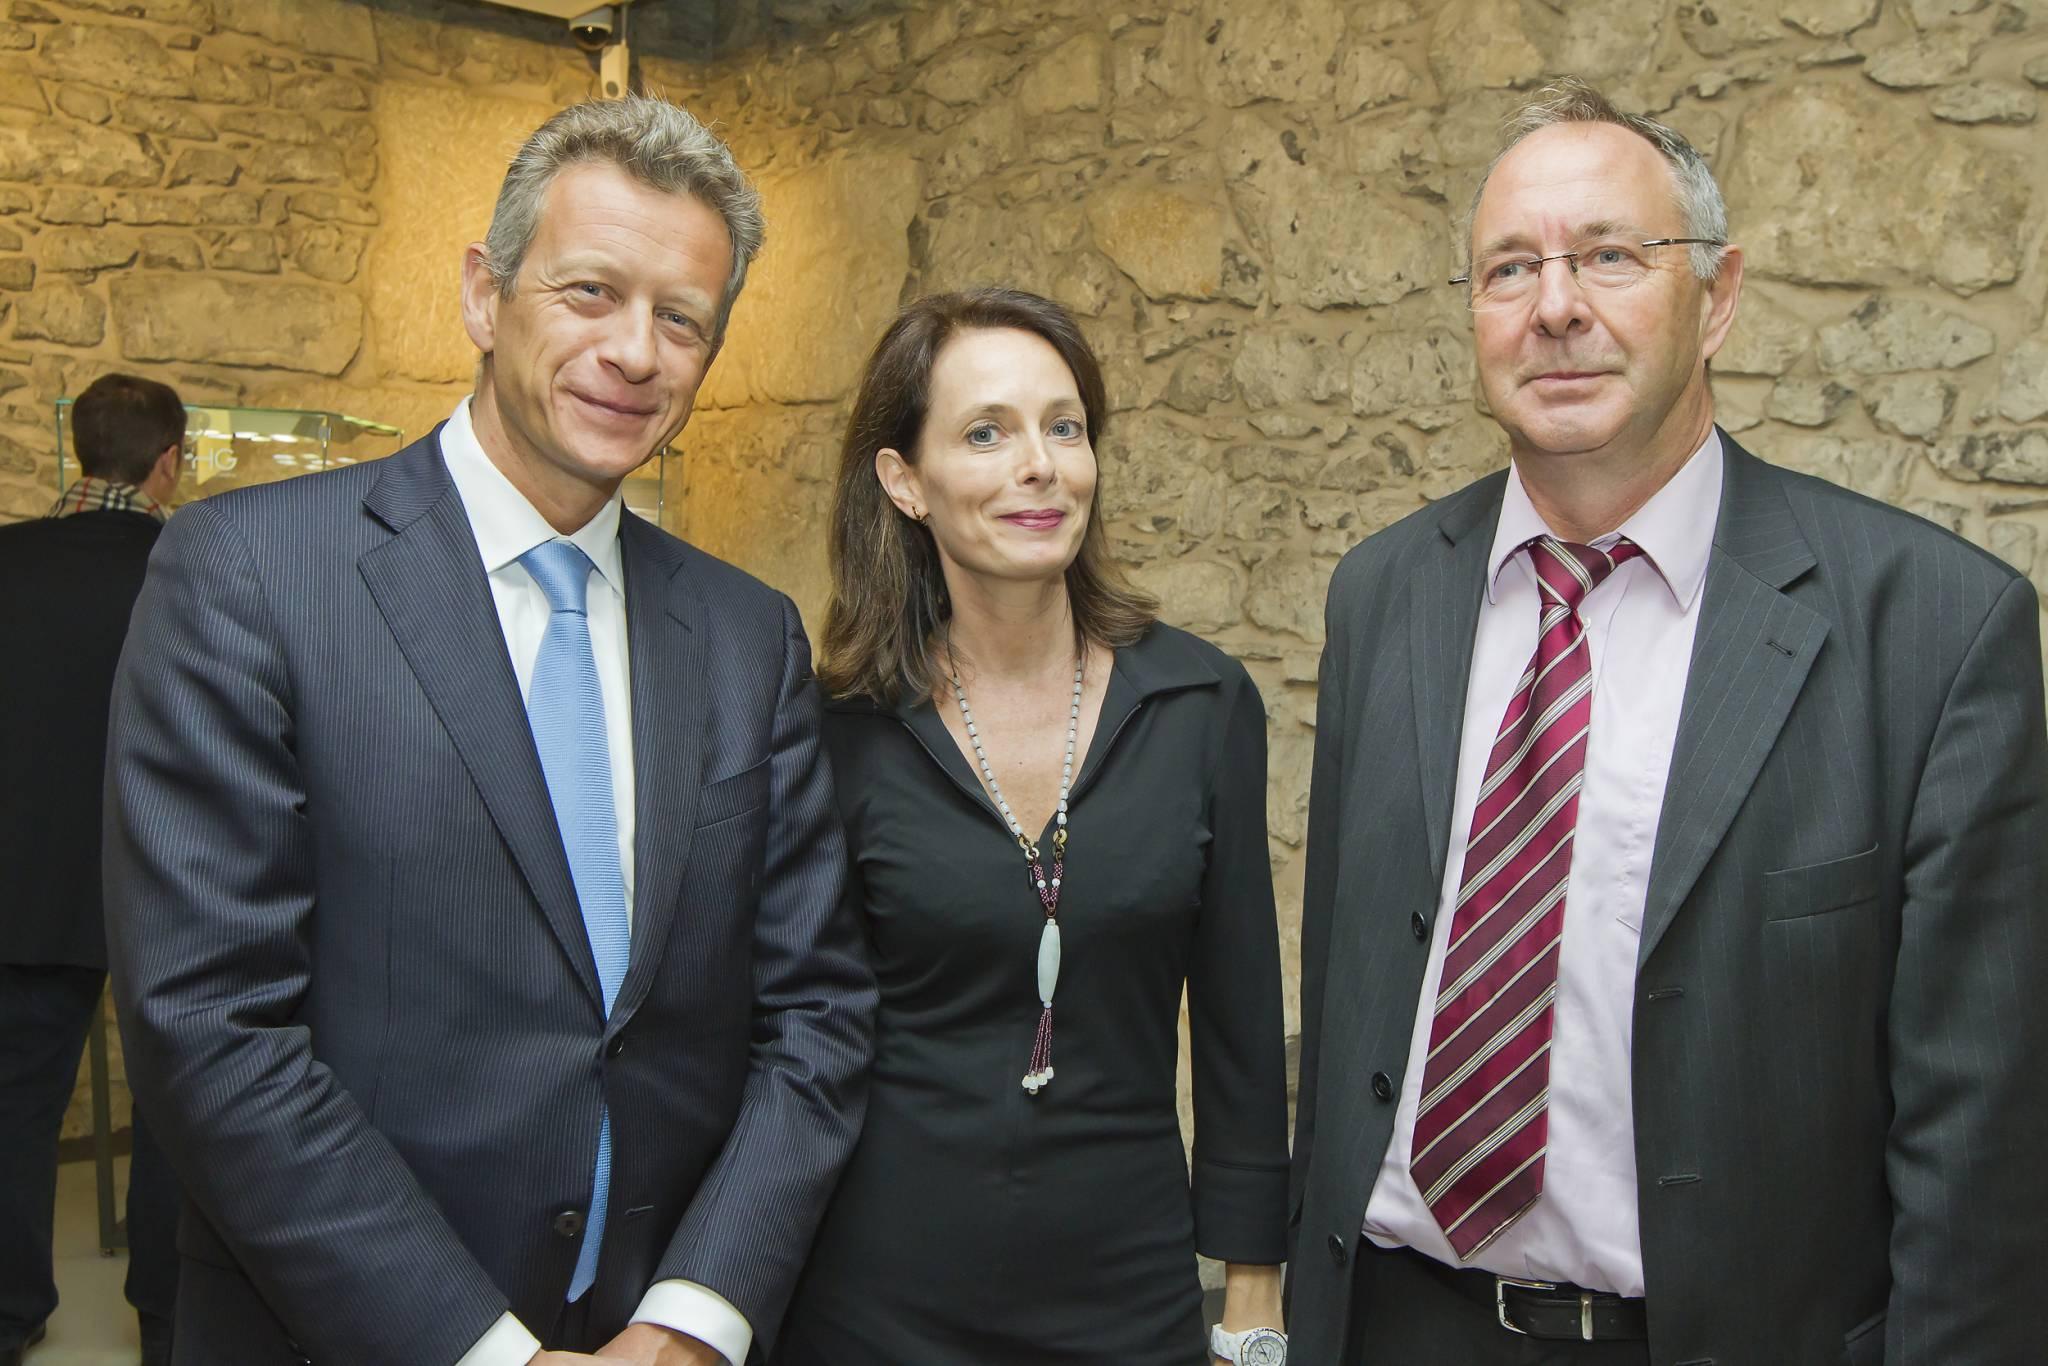 Benoît Clivio, Director of Banque Privée Edmond de Rothschild (BPER) and Valérie Boscat, Communication director of BPER and Daniel Favre, President of TimeLab, November 8th, 2011